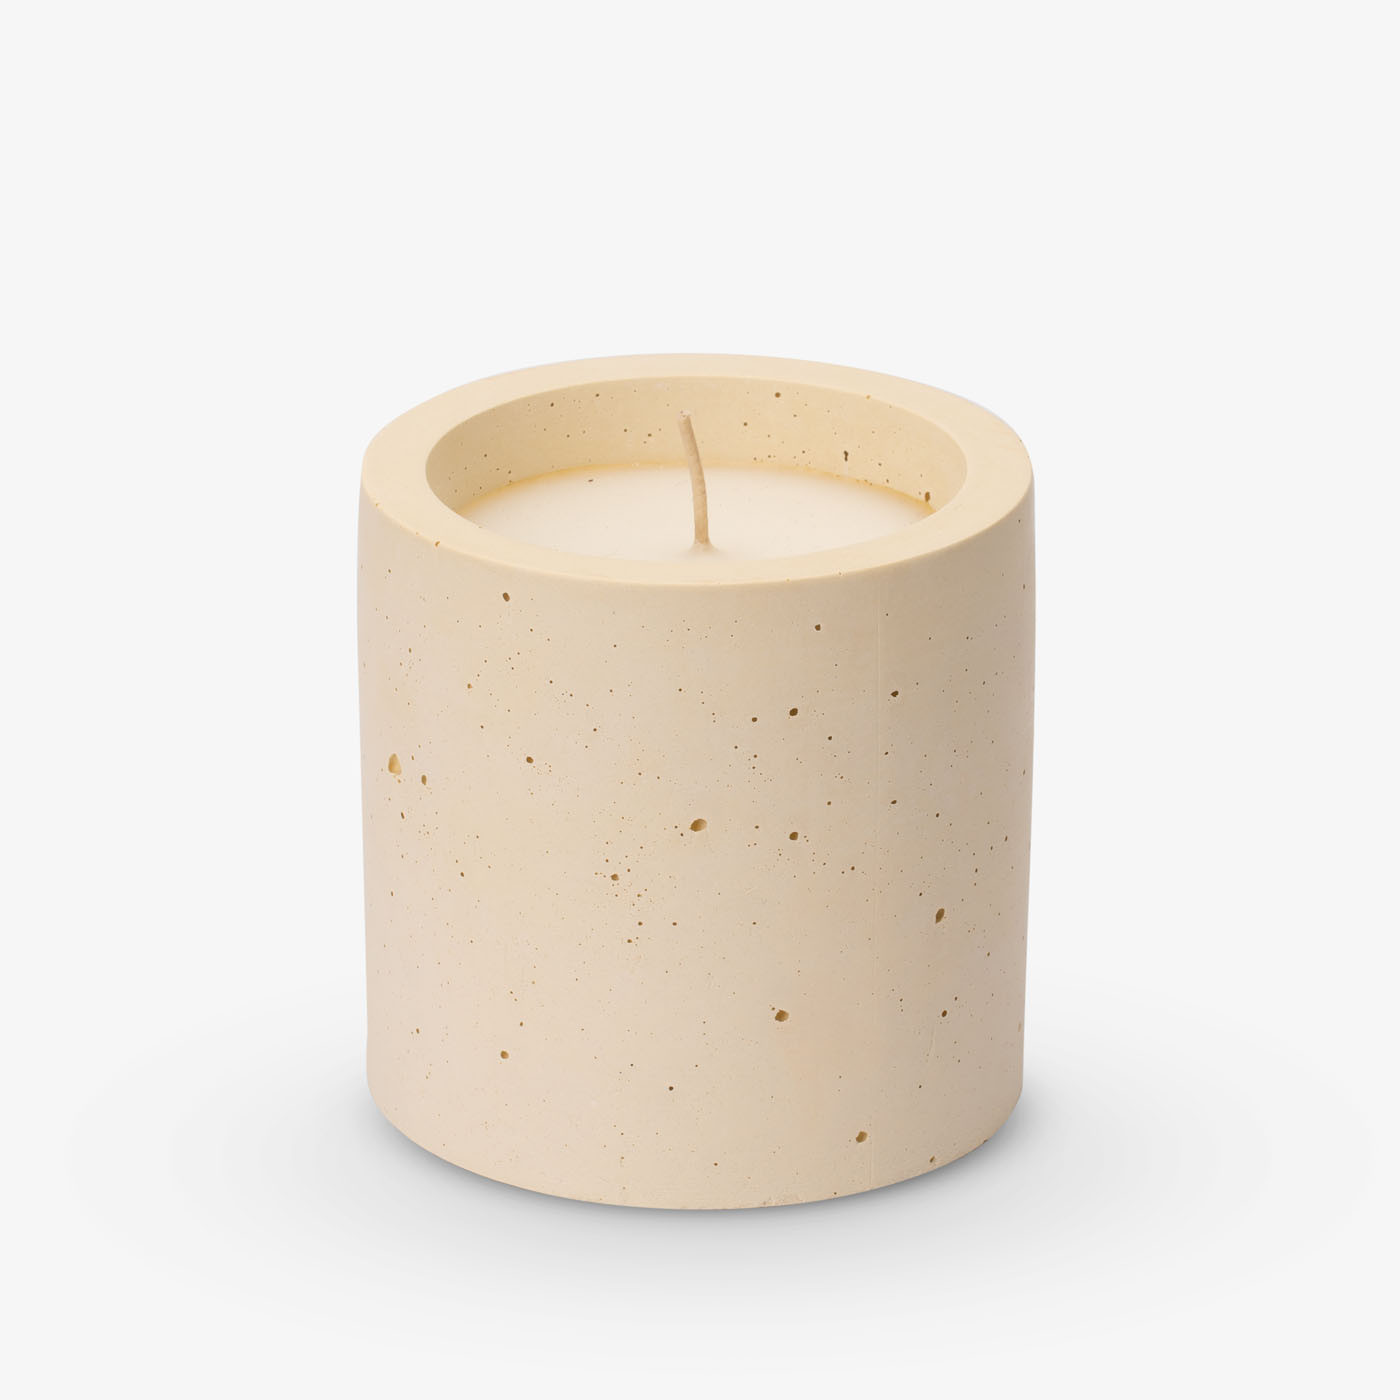 Kerze Lights One-Two-Three 10x10 cm | Pastellgelb